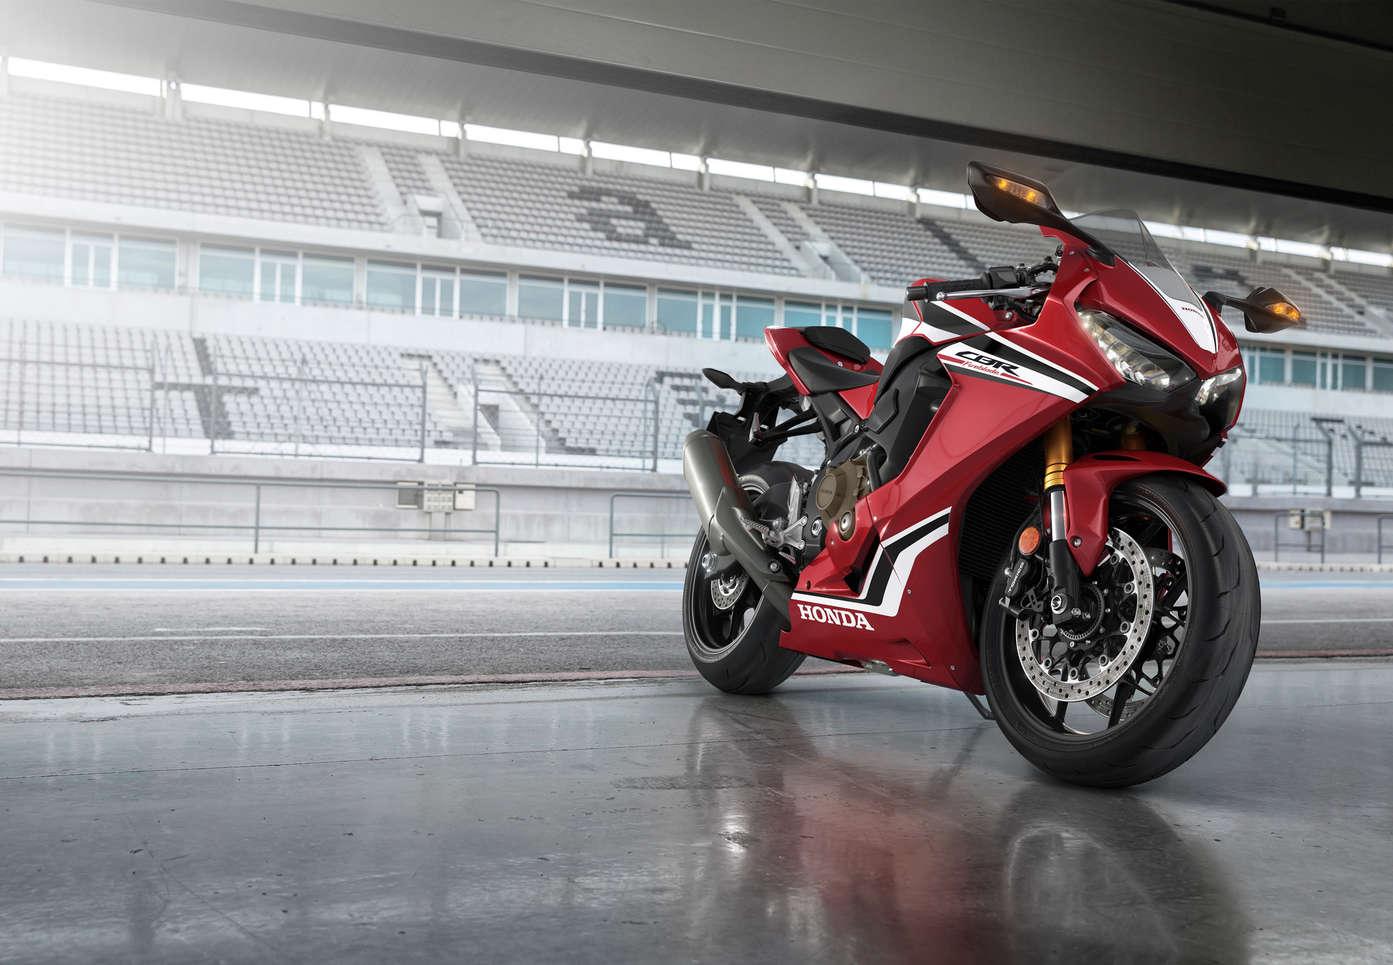 Overview Cbr1000rr Fireblade Super Sport Range Motorcycles